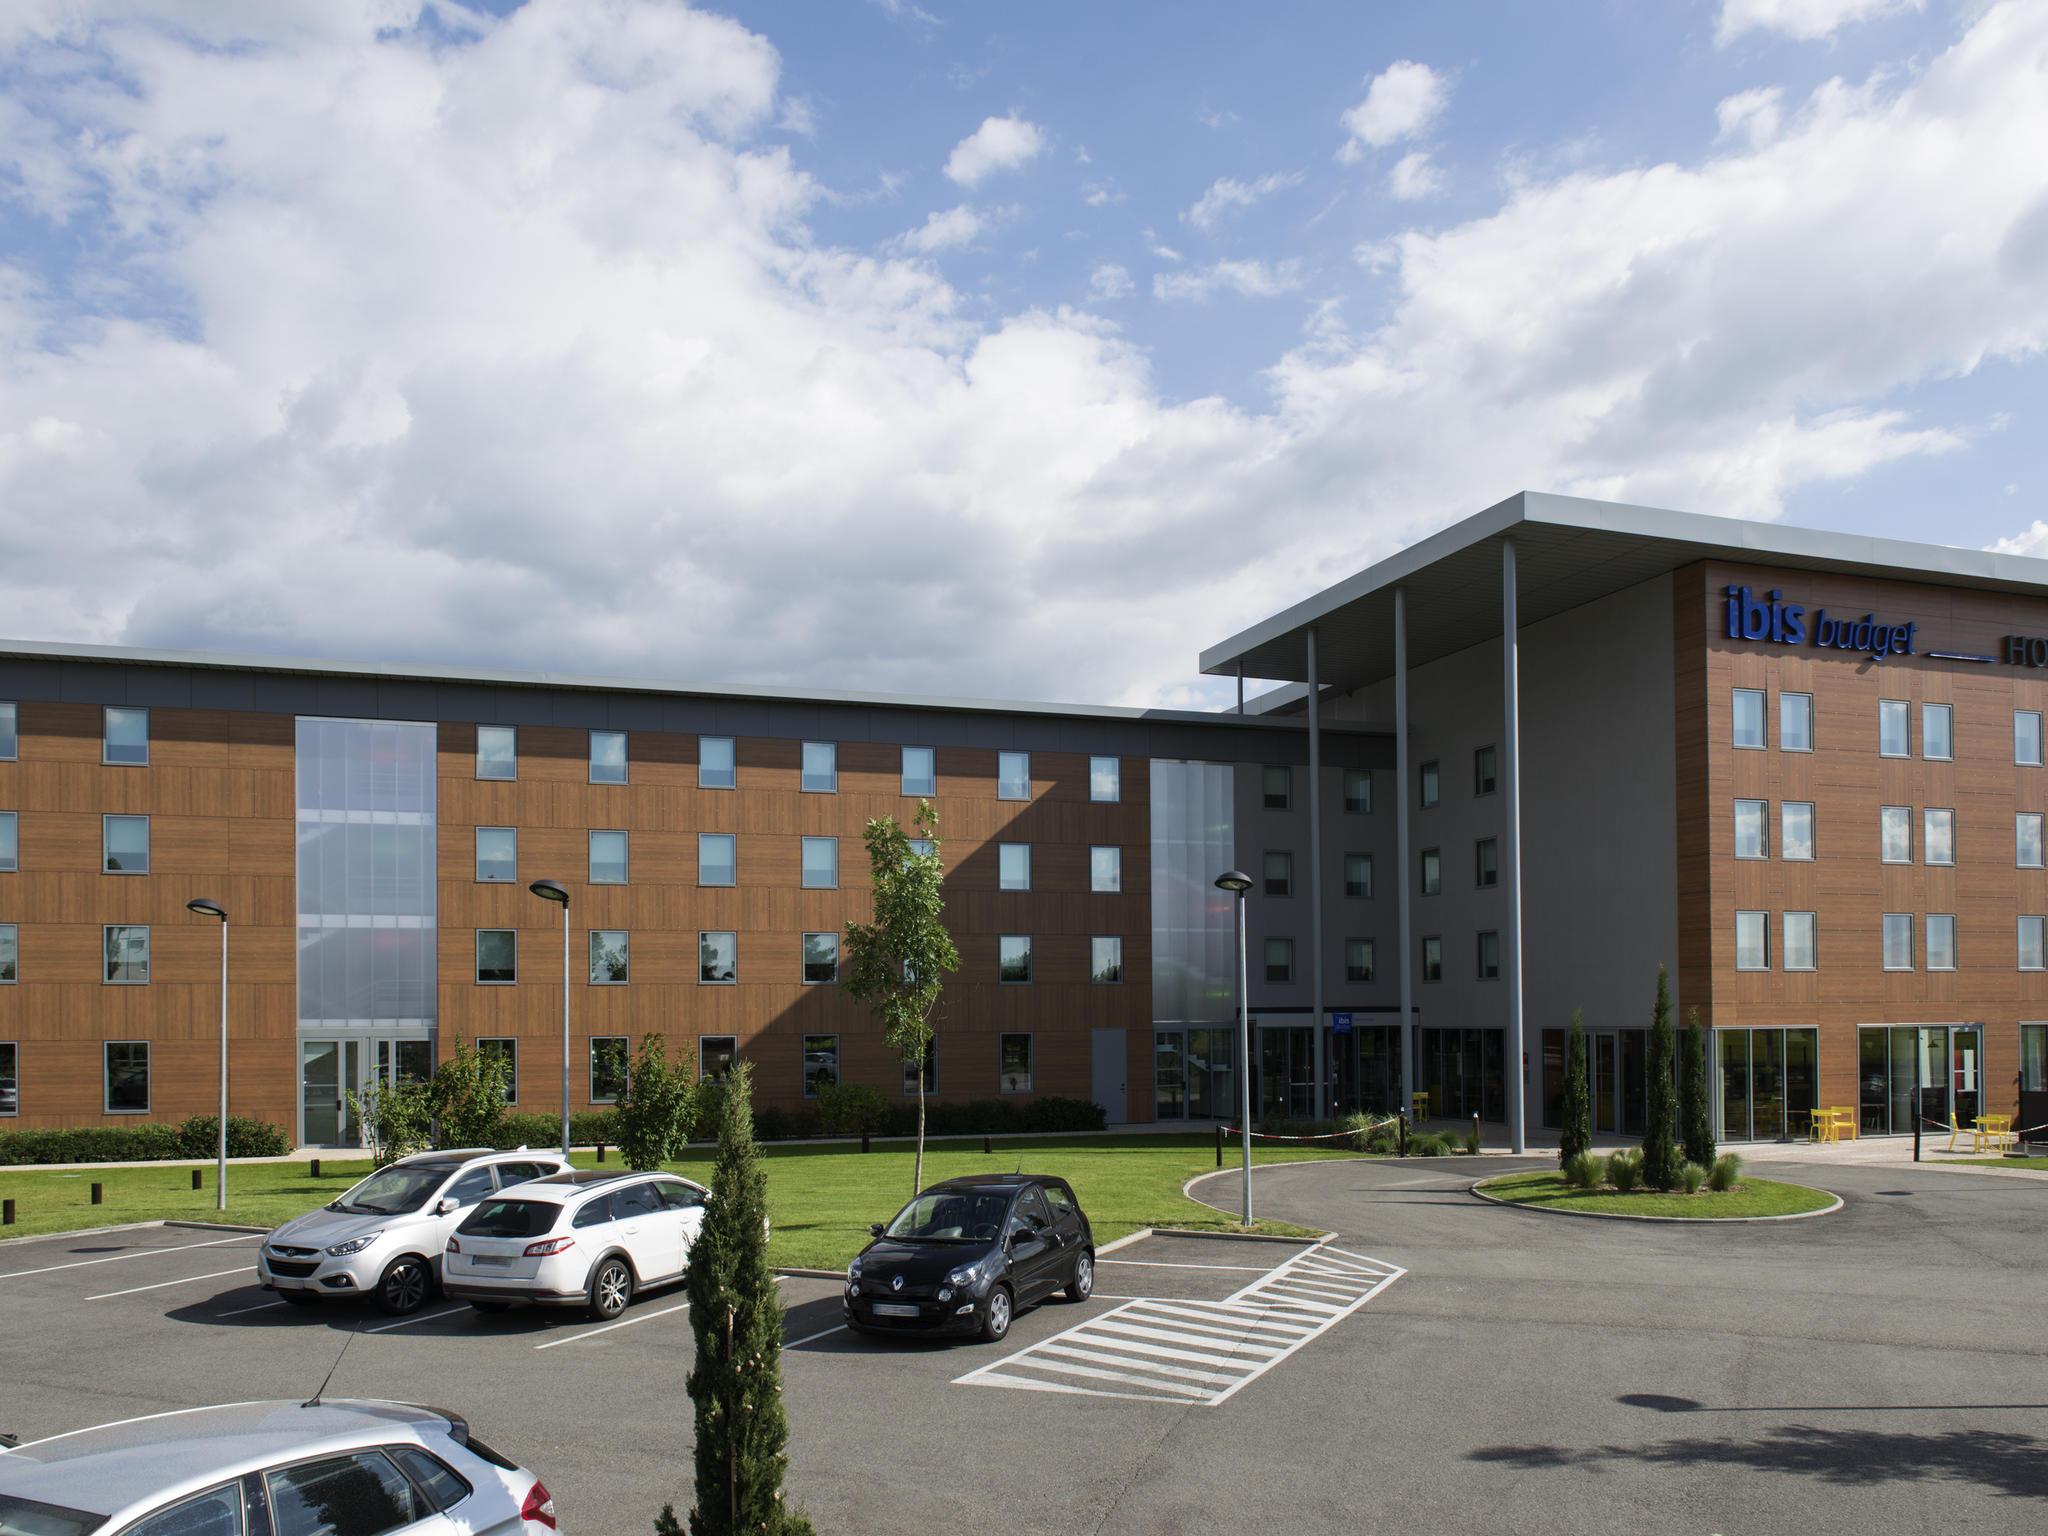 فندق - ibis budget Aéroport Lyon Saint-Exupéry